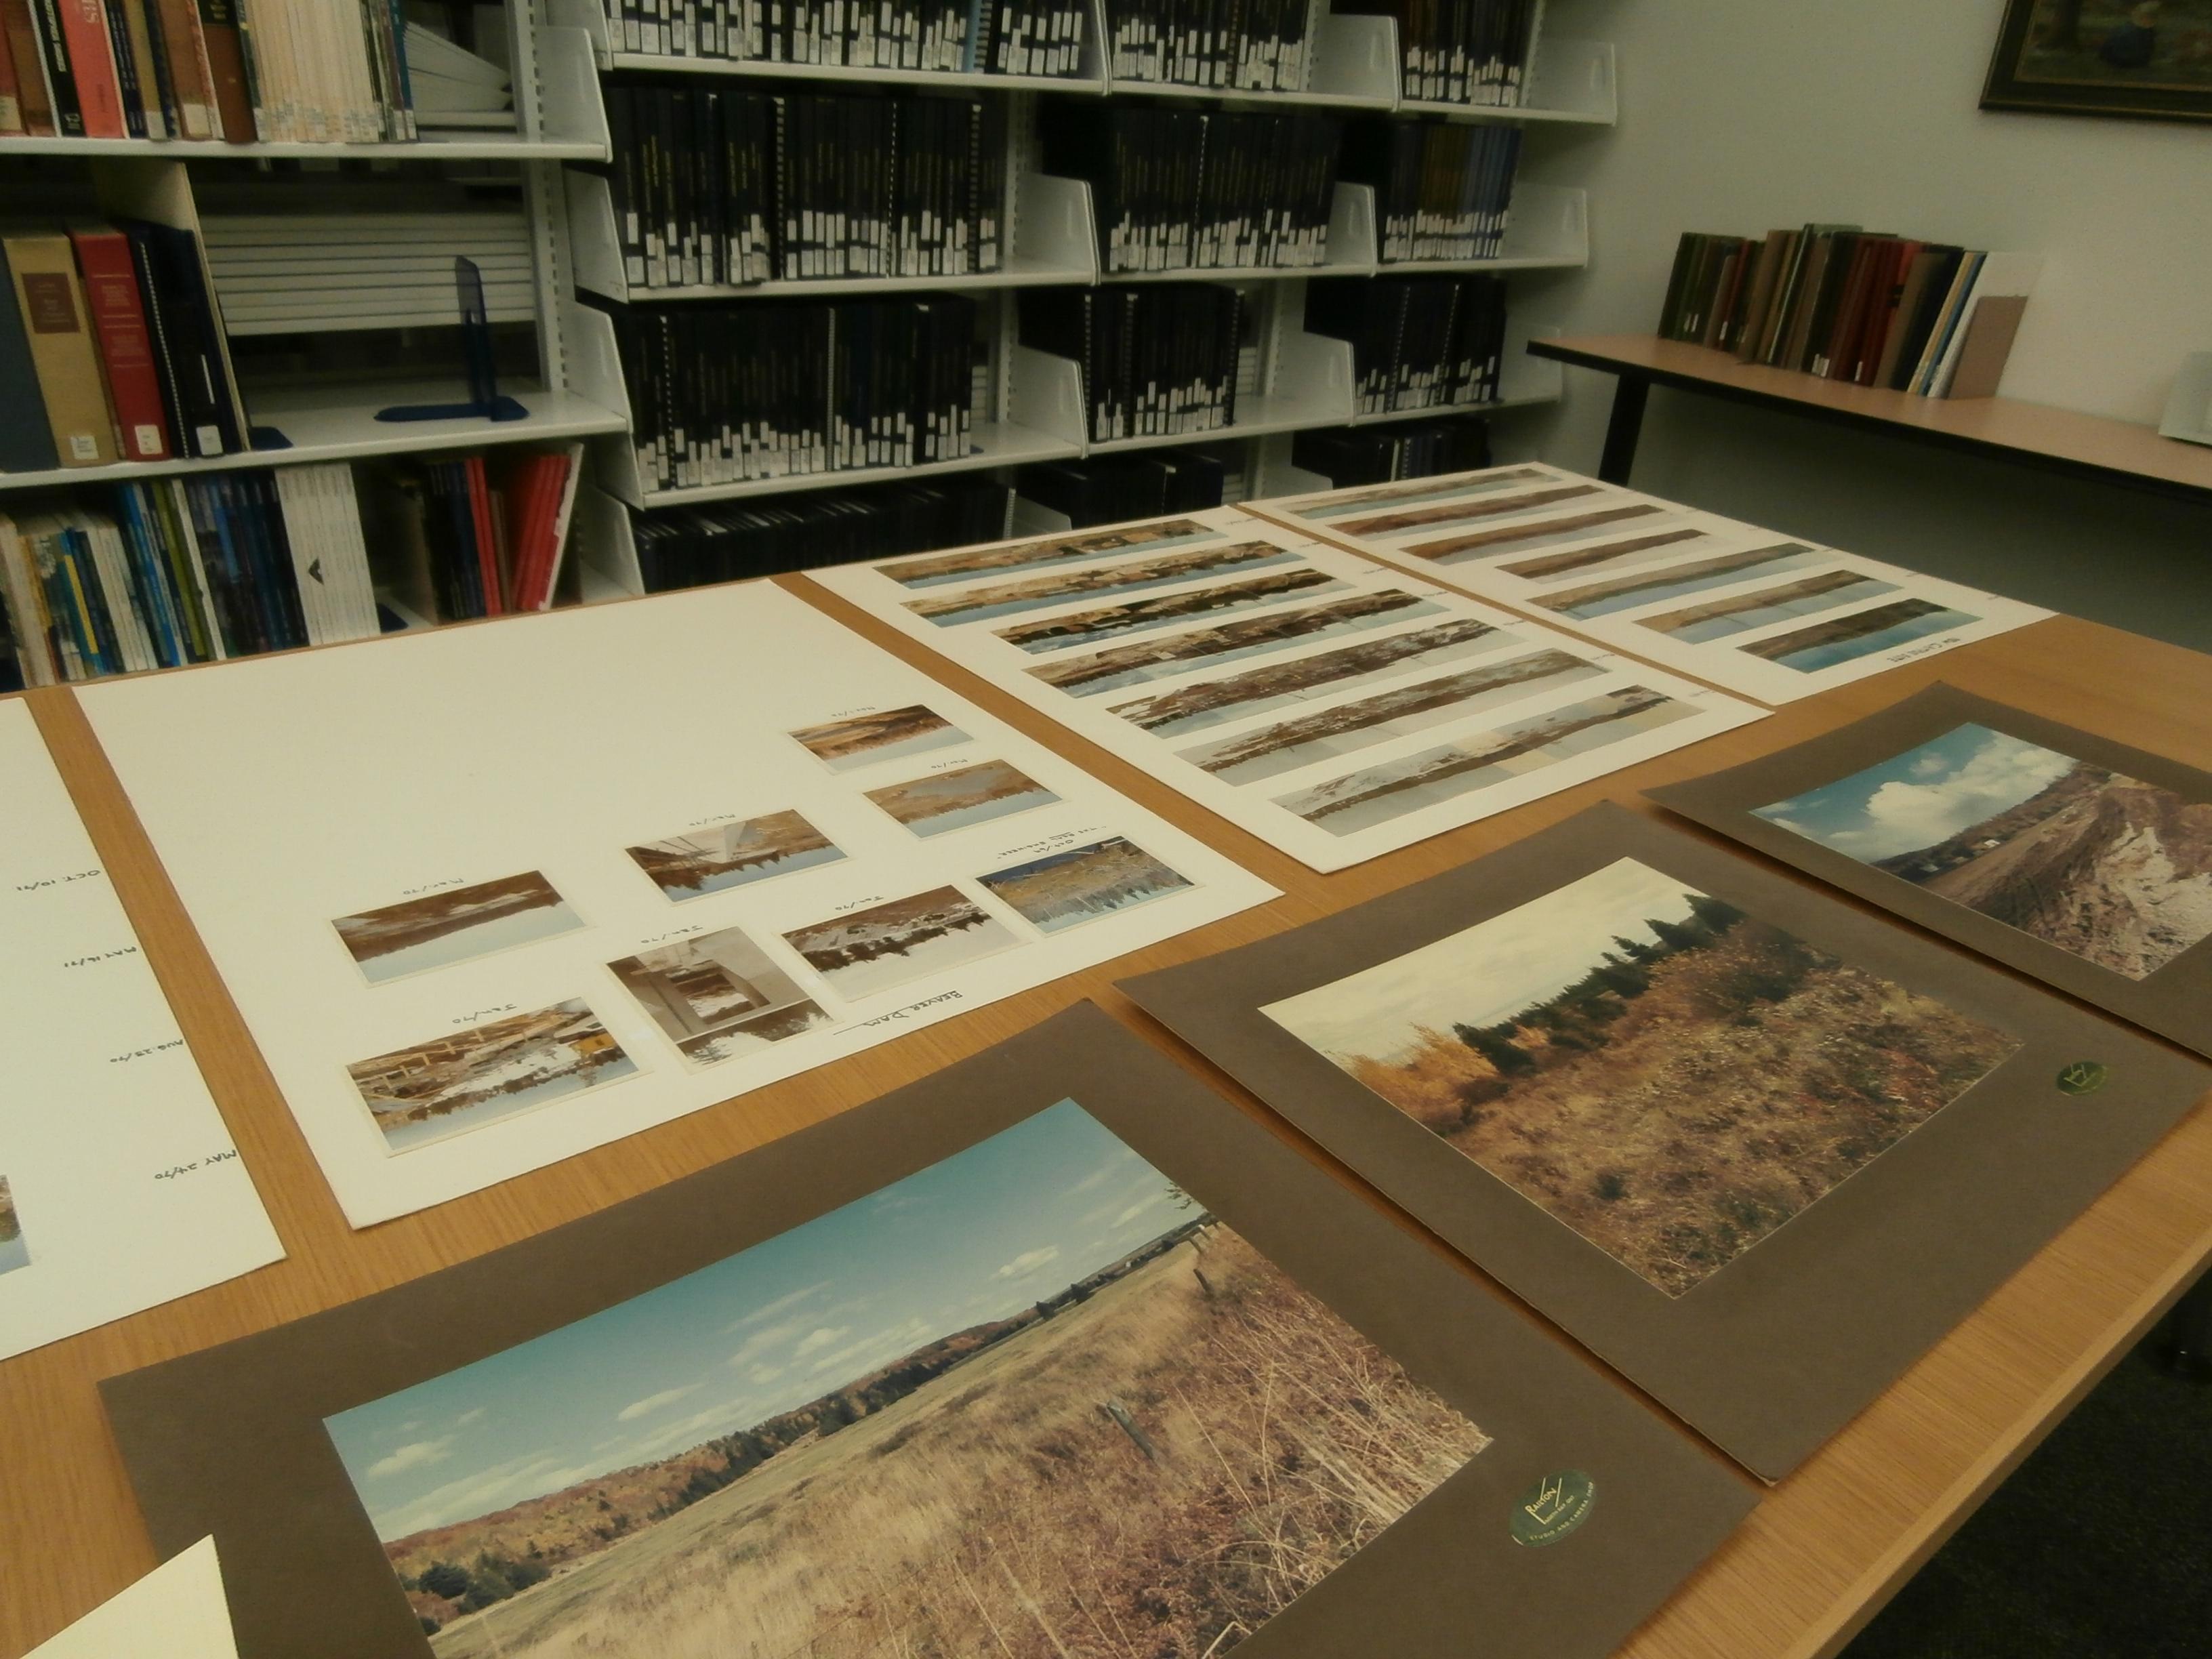 Photos of Land Prior to Campus Build